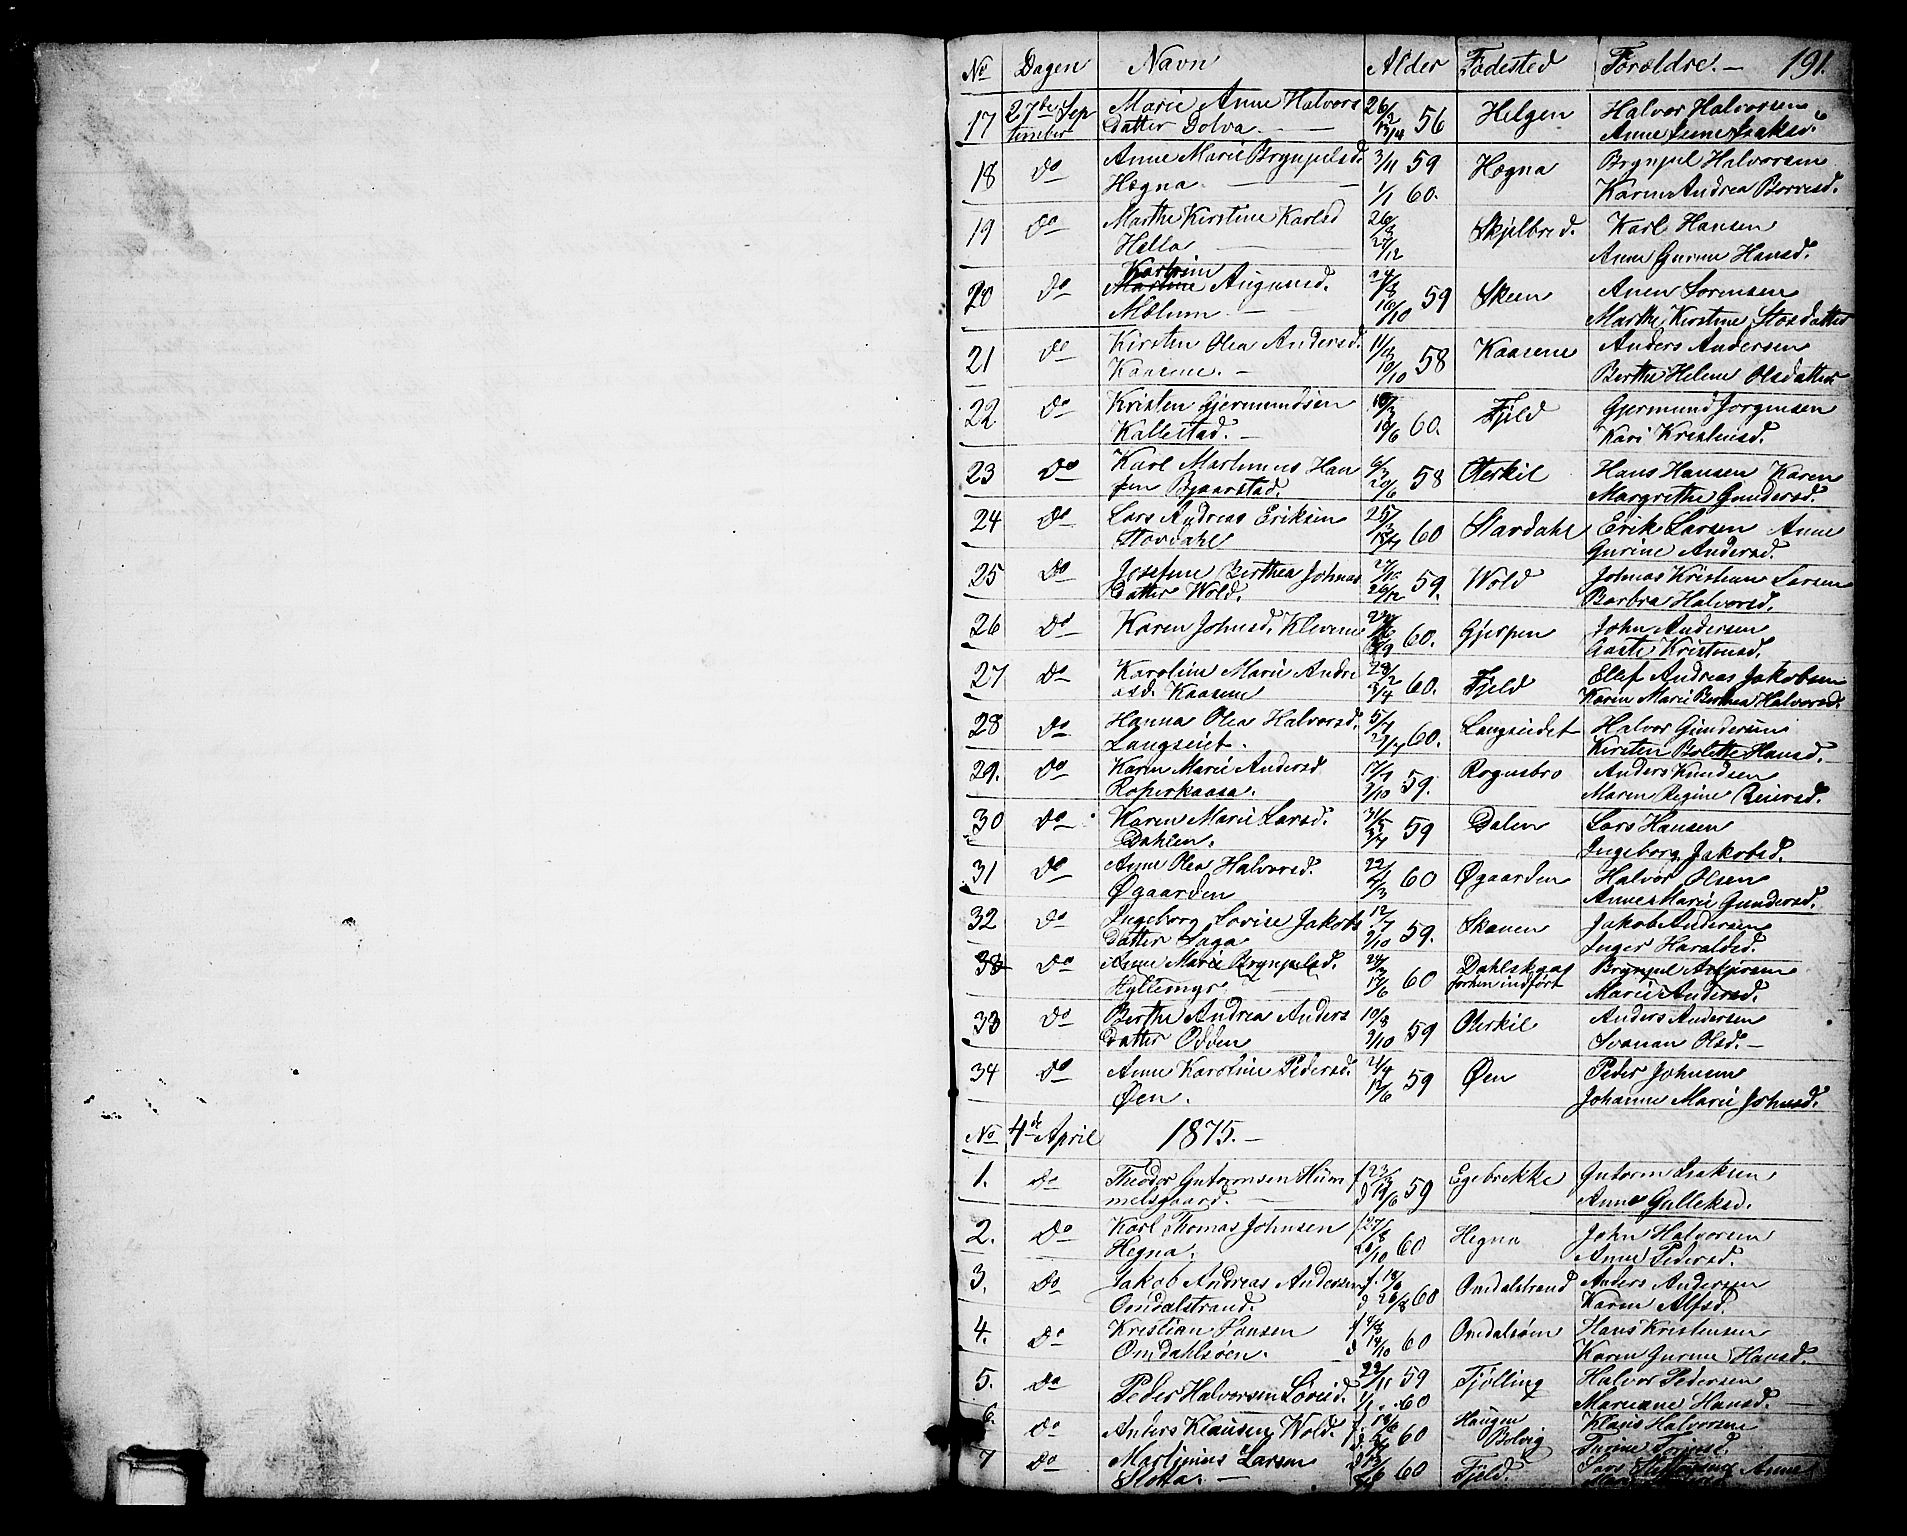 SAKO, Solum kirkebøker, G/Gb/L0002: Klokkerbok nr. II 2, 1859-1879, s. 191